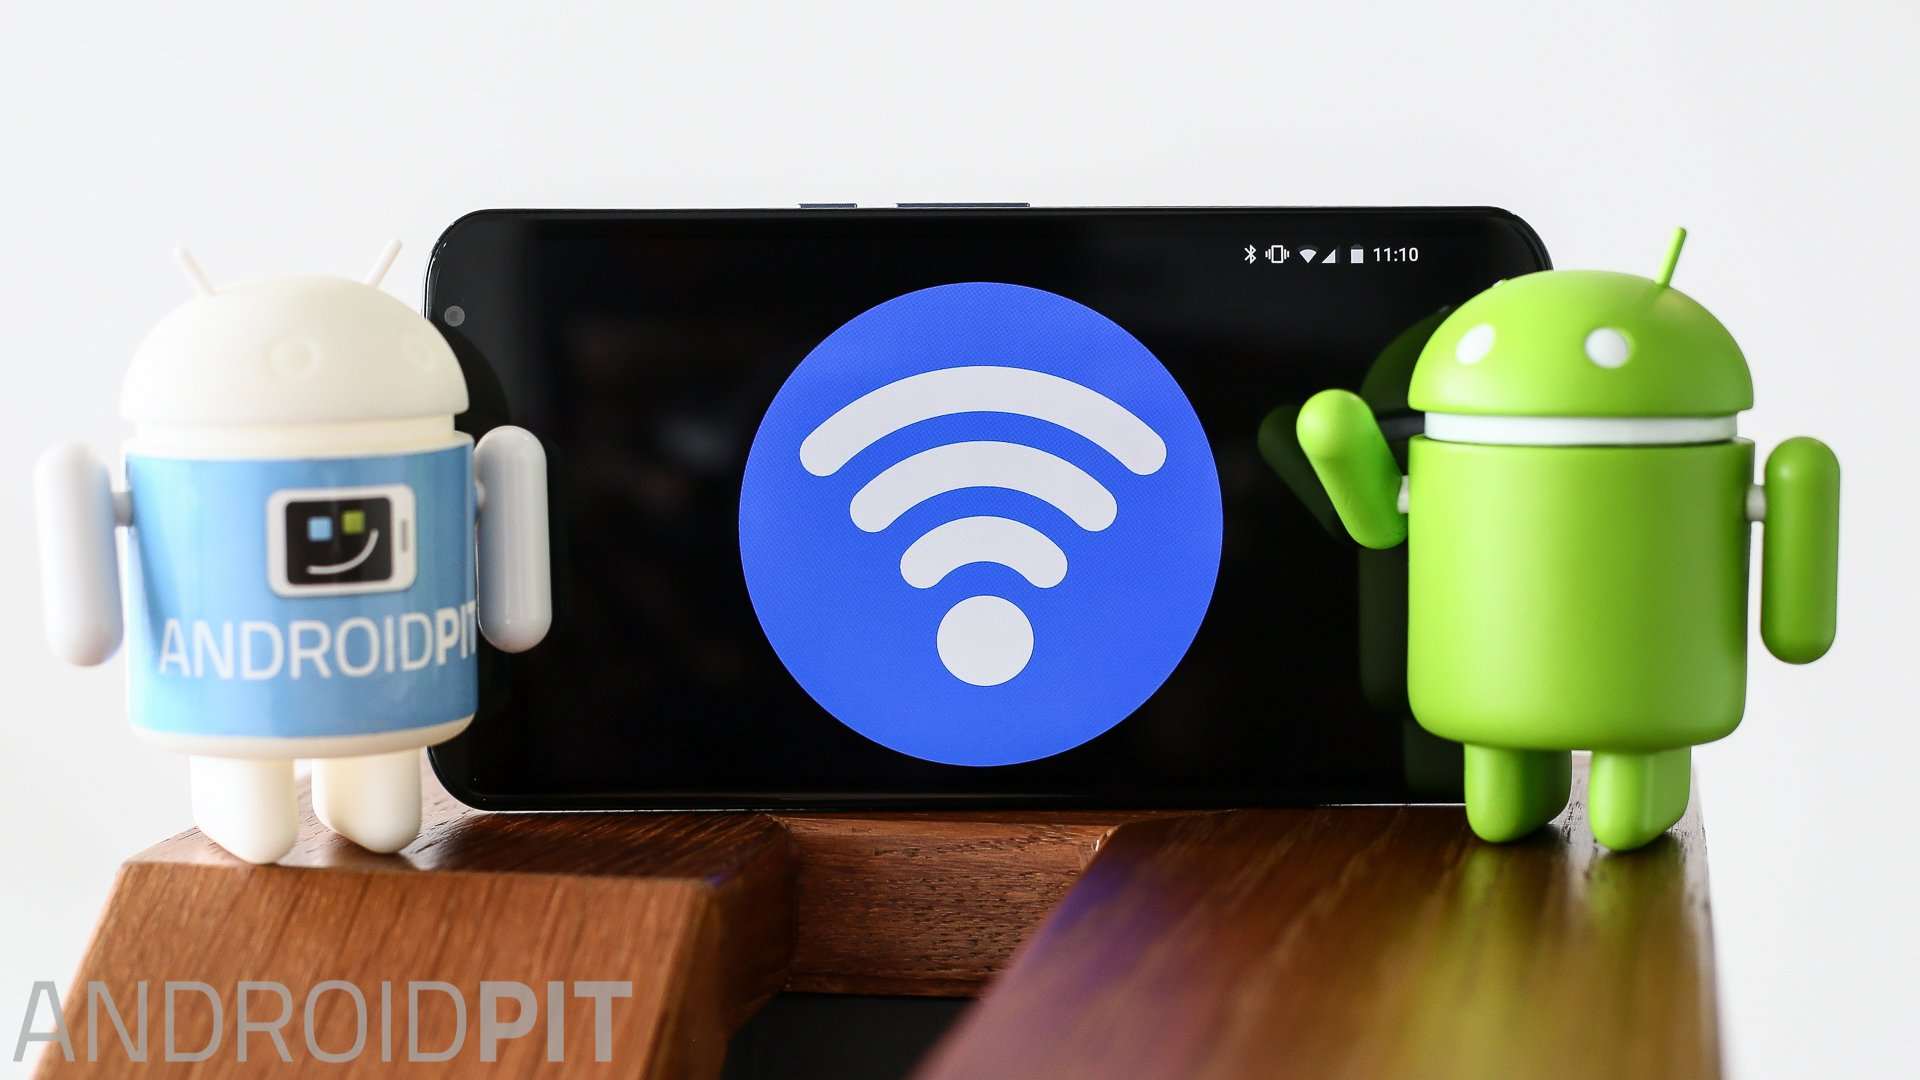 Android Wlan Verstärken